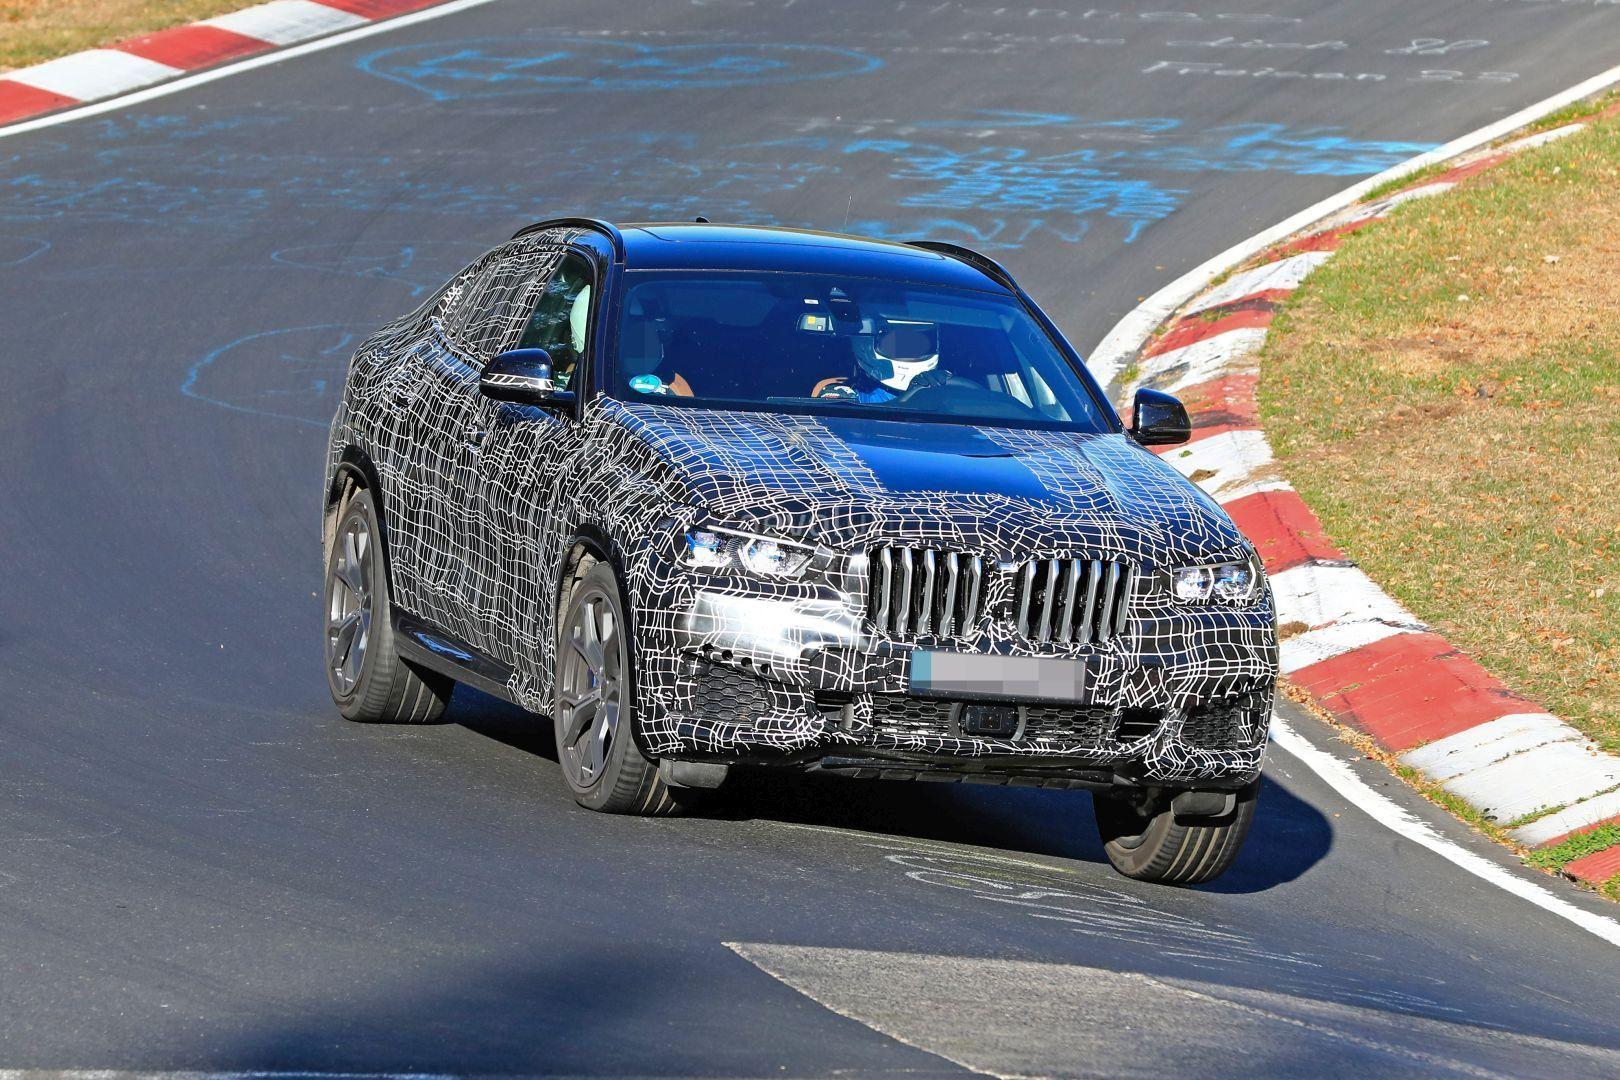 2020-bmw-x6-laps-nurburgring-prototype-reveals-sharper-look_3